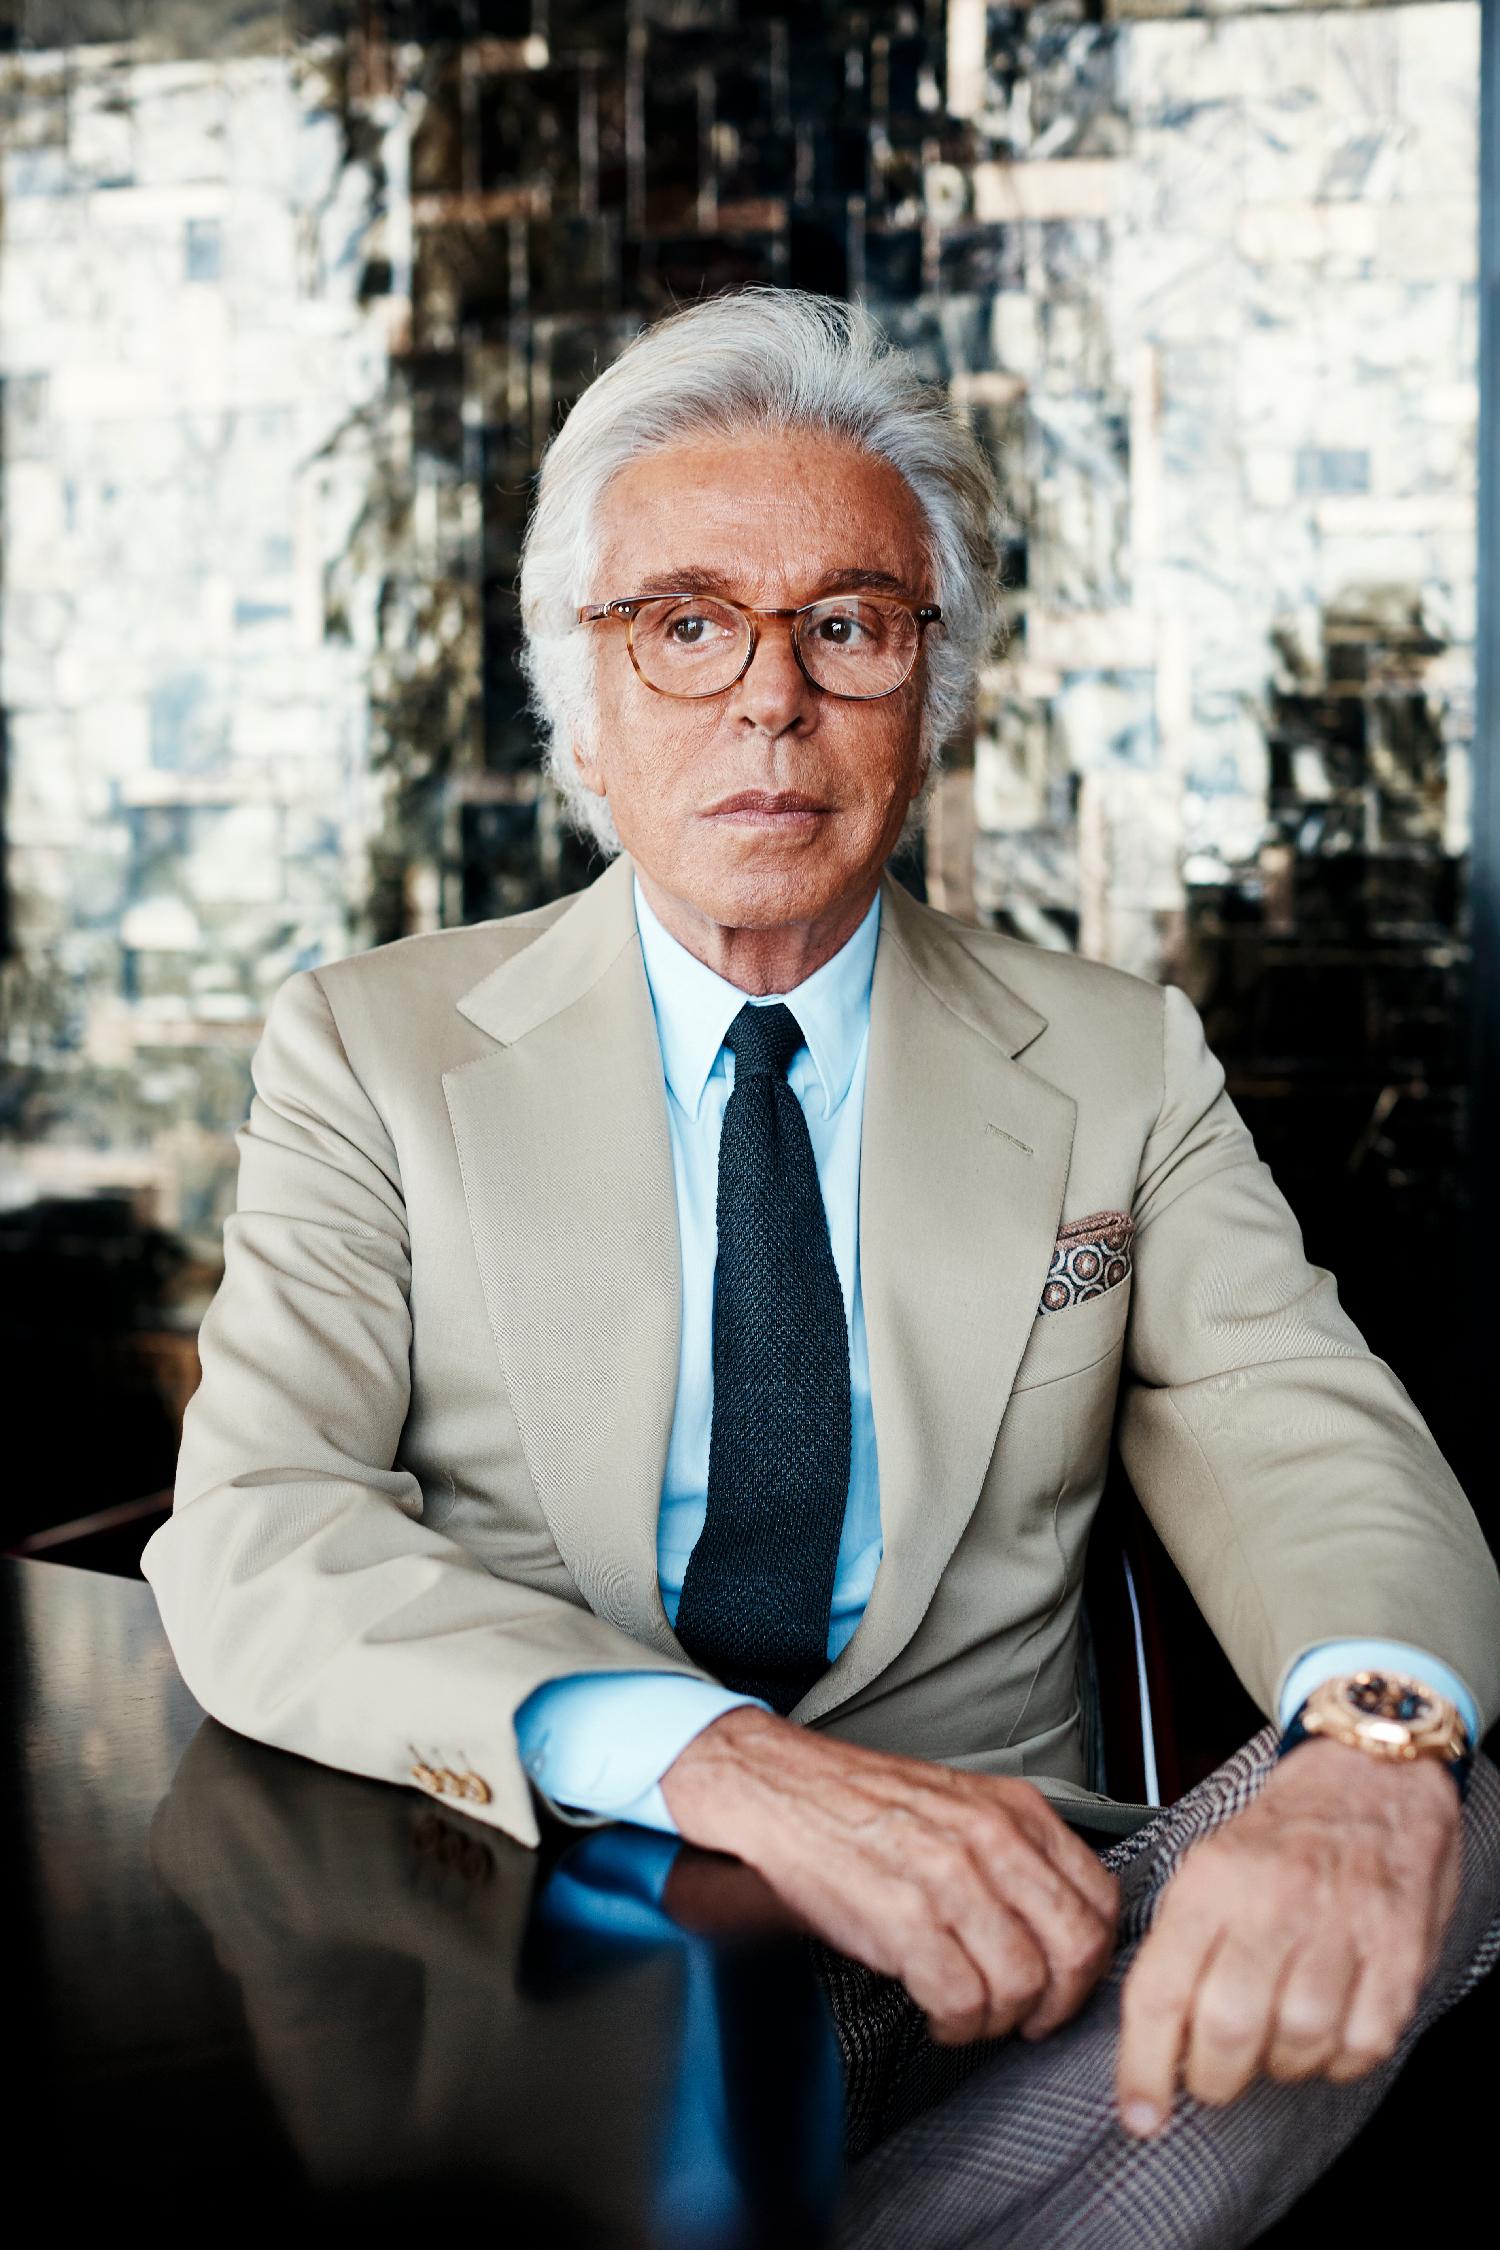 Giancarlo-Giacometti-by-Weston-Wells.jpg